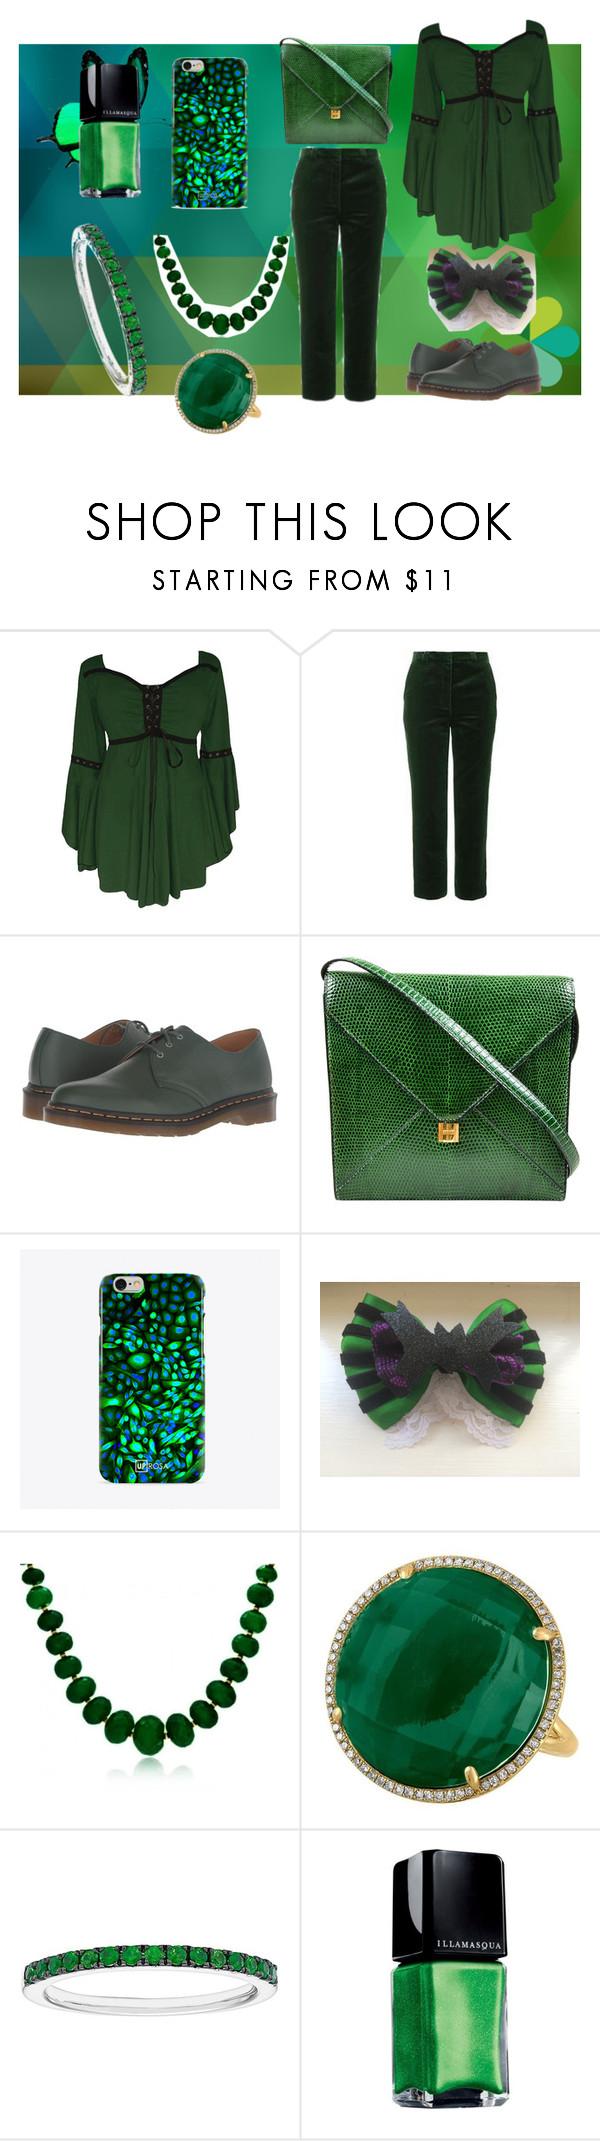 """redo rainbow set 22"" by makaylahurt74 on Polyvore featuring Topshop, Dr. Martens, Hermès, UPROSA, Bling Jewelry and Illamasqua"